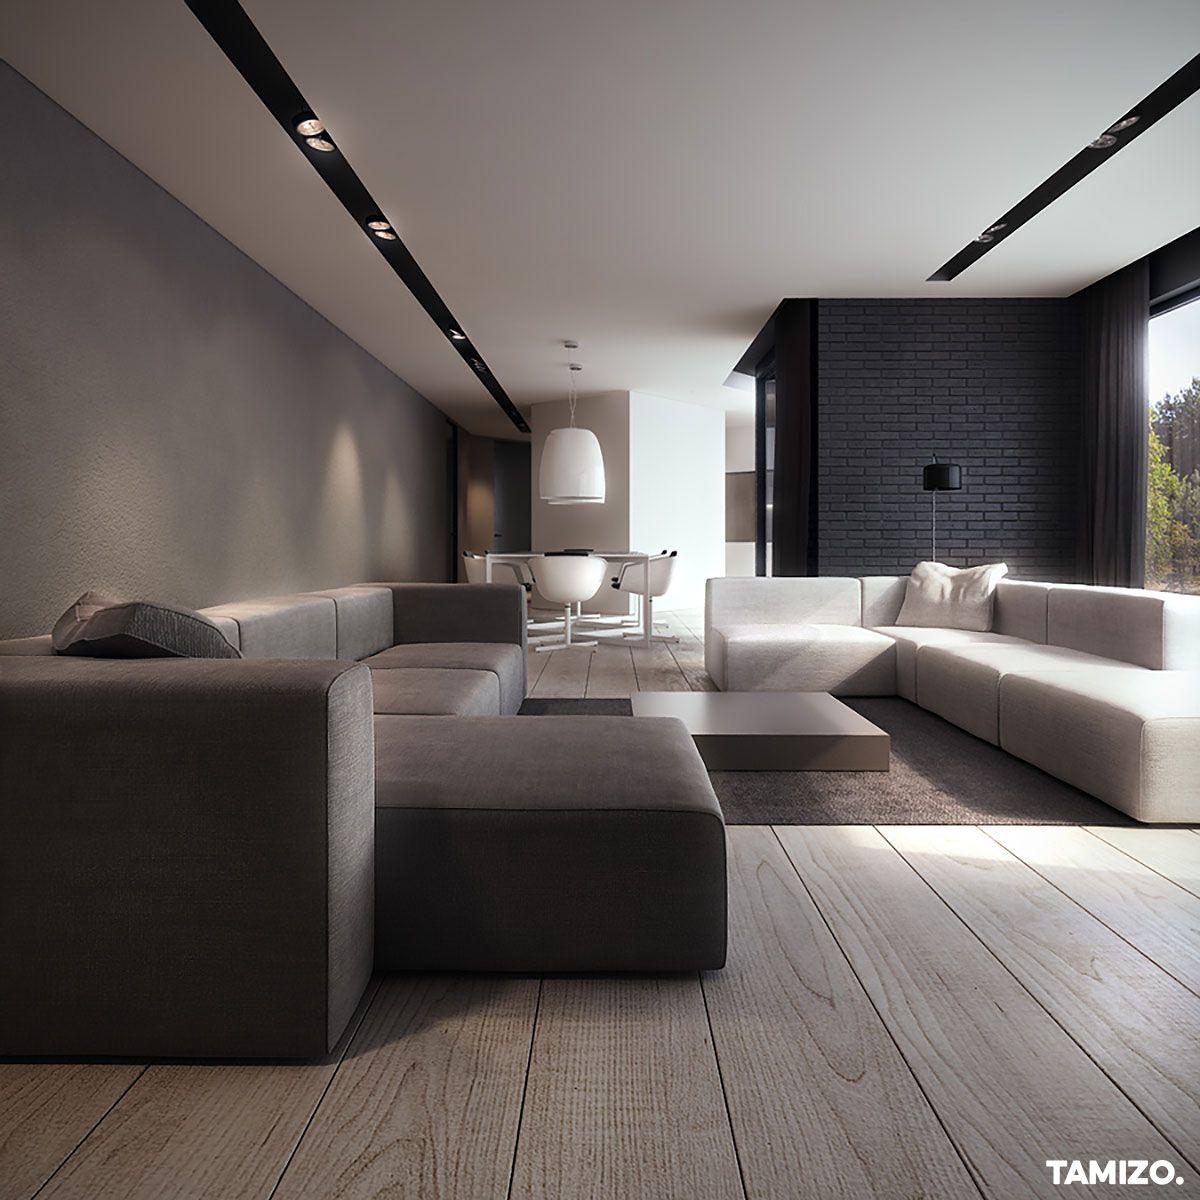 I031 Tamizo Architekci Wnetrza Domu V House Projektowanie Pabianice 01 Interior Design Living Room Luxury Living Room Design Home Interior Design Ultra modern living room